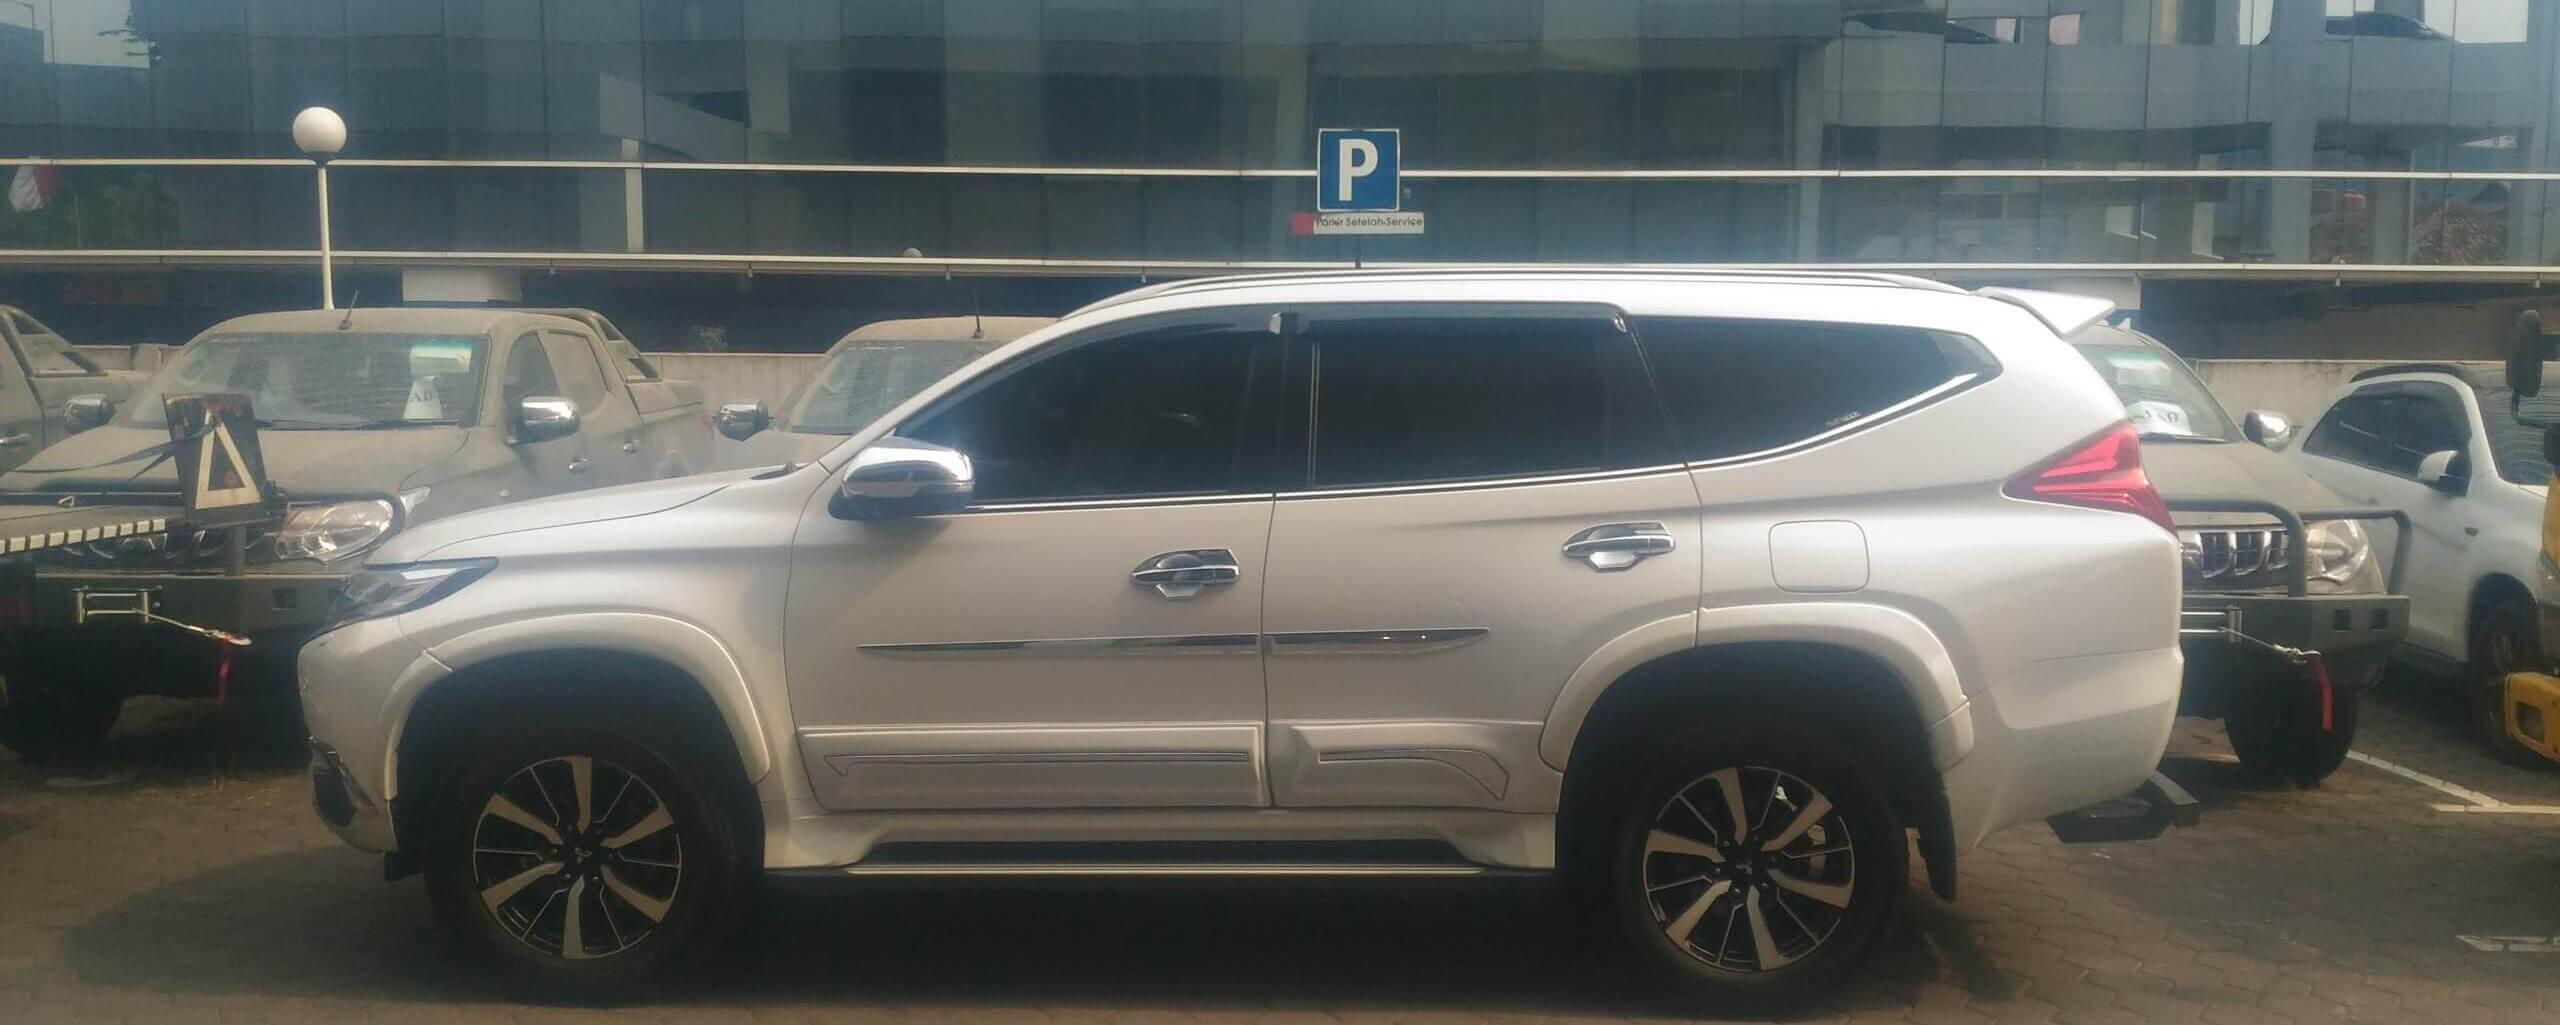 Dealer Mitsubishi Motors | Dealer Mitsubishi | Promo Dealer Mitsubishi